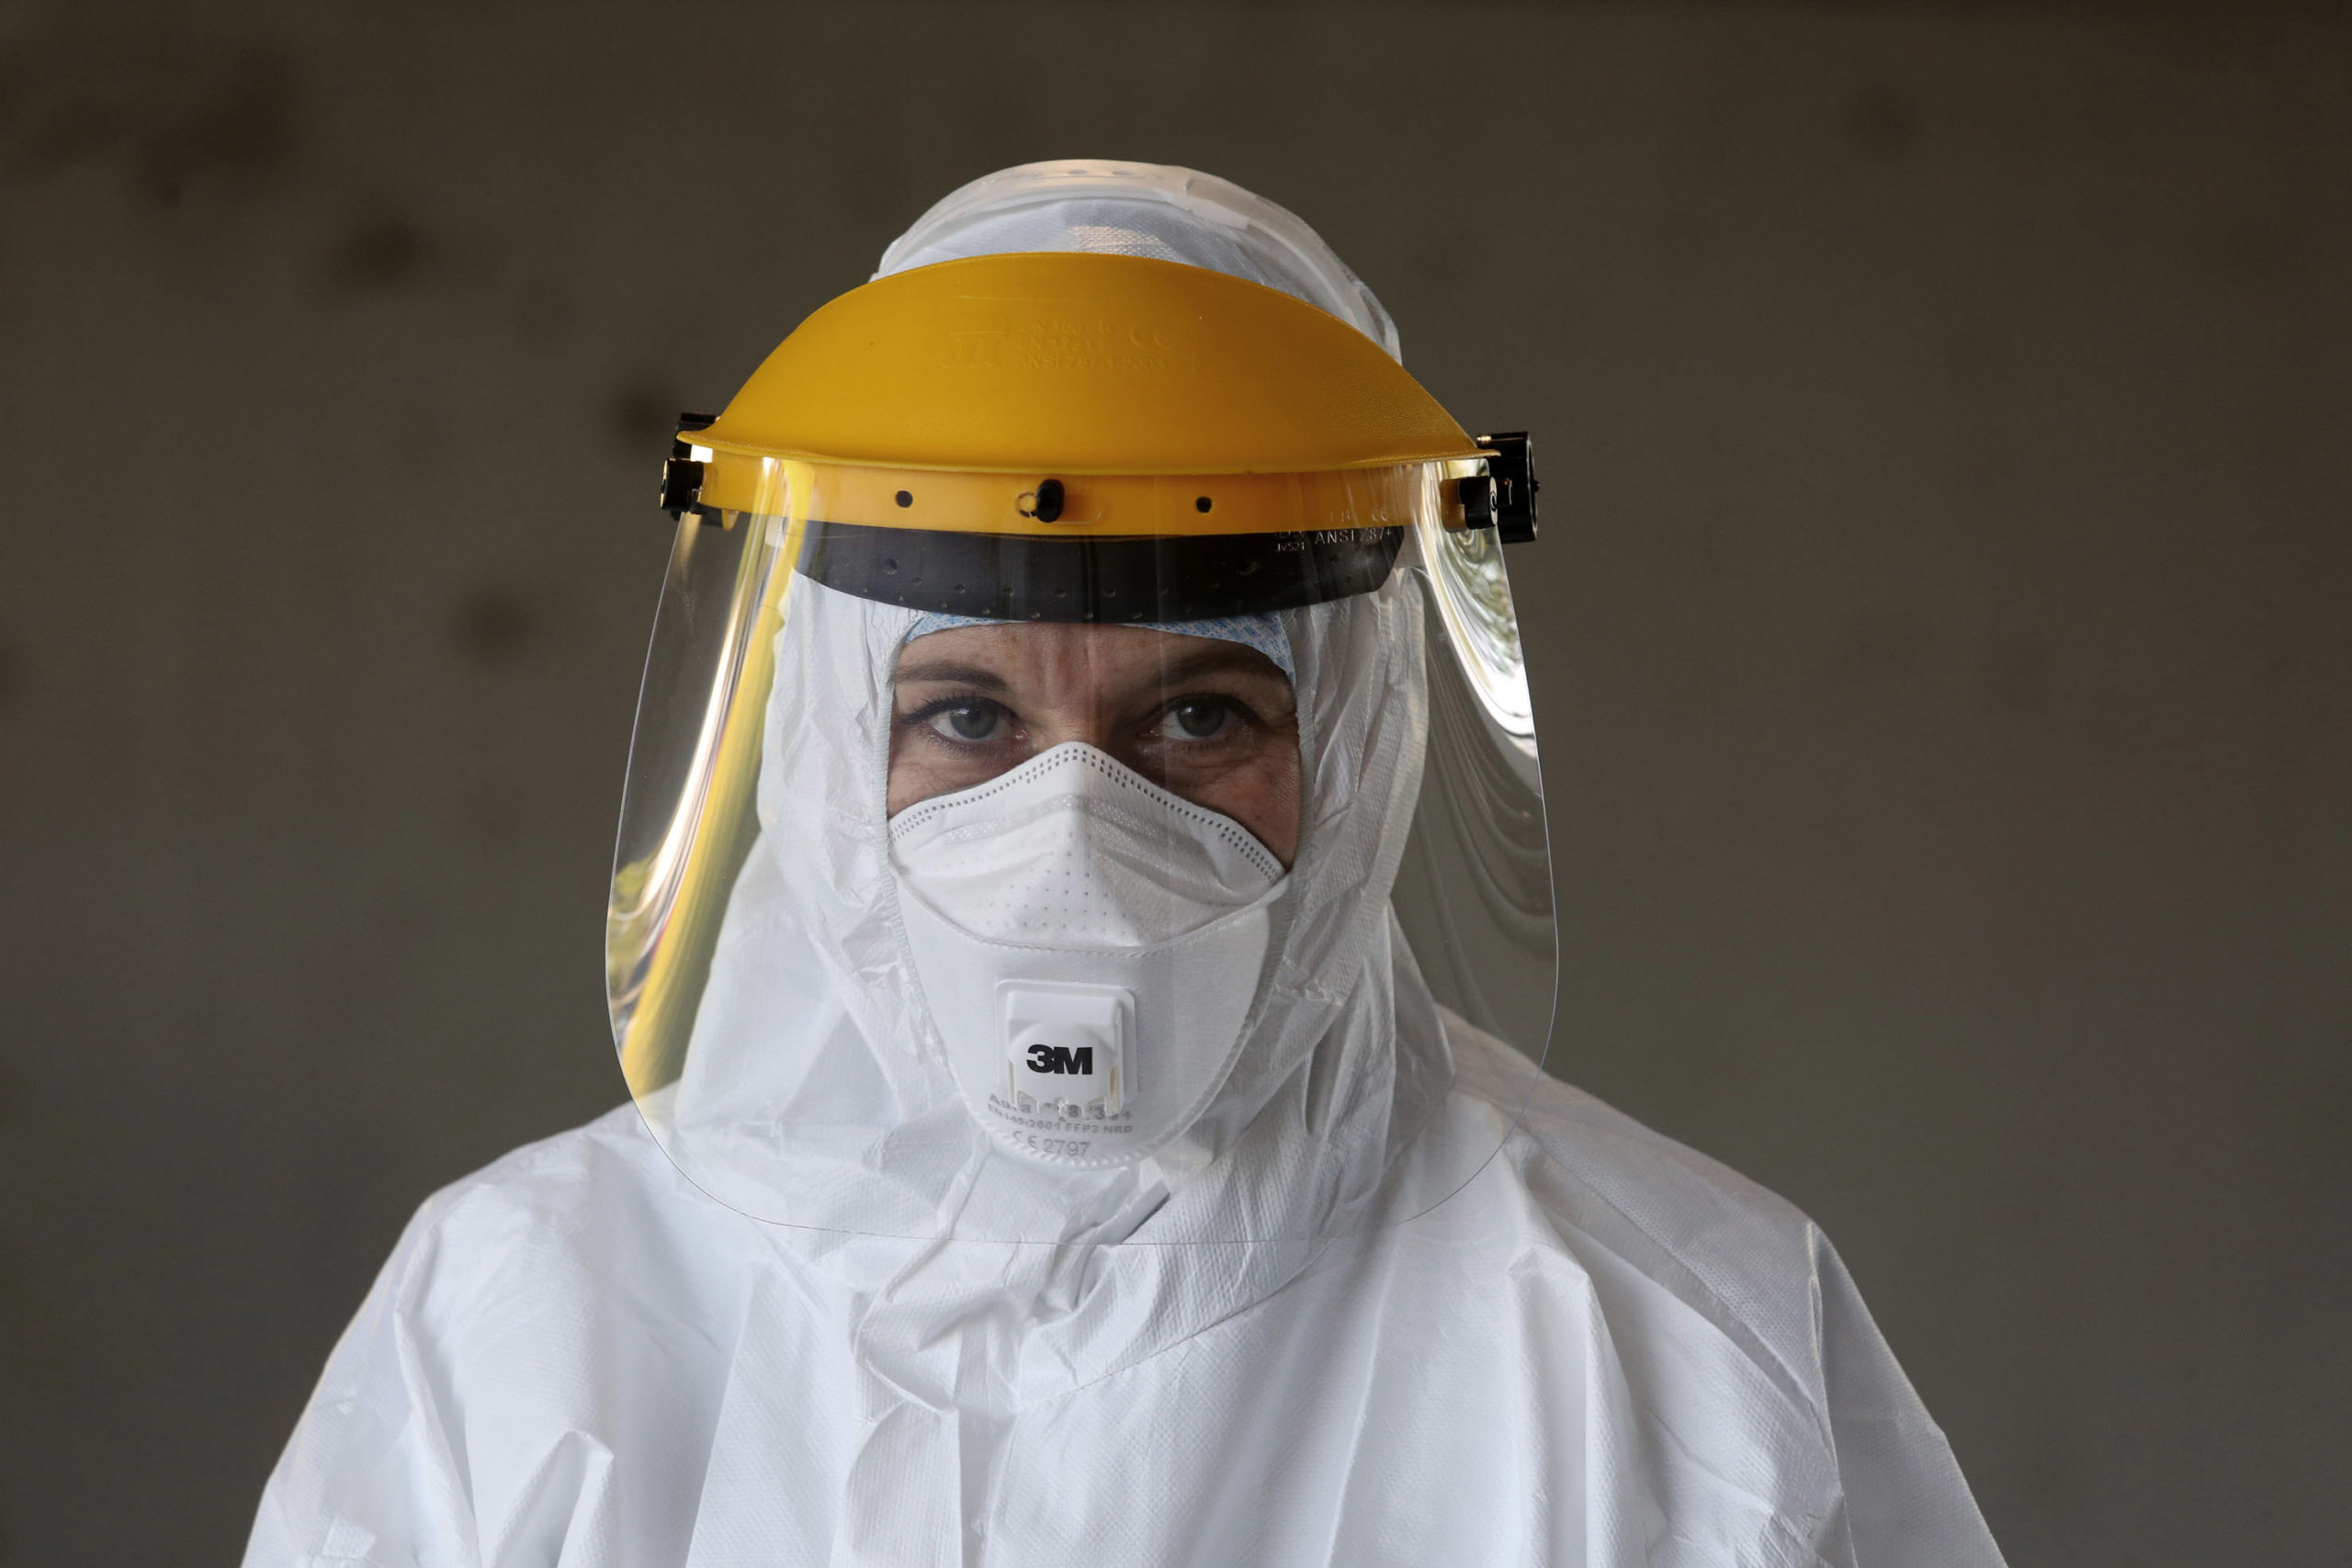 Попова назвала выход из ситуации с эпидемией коронавируса